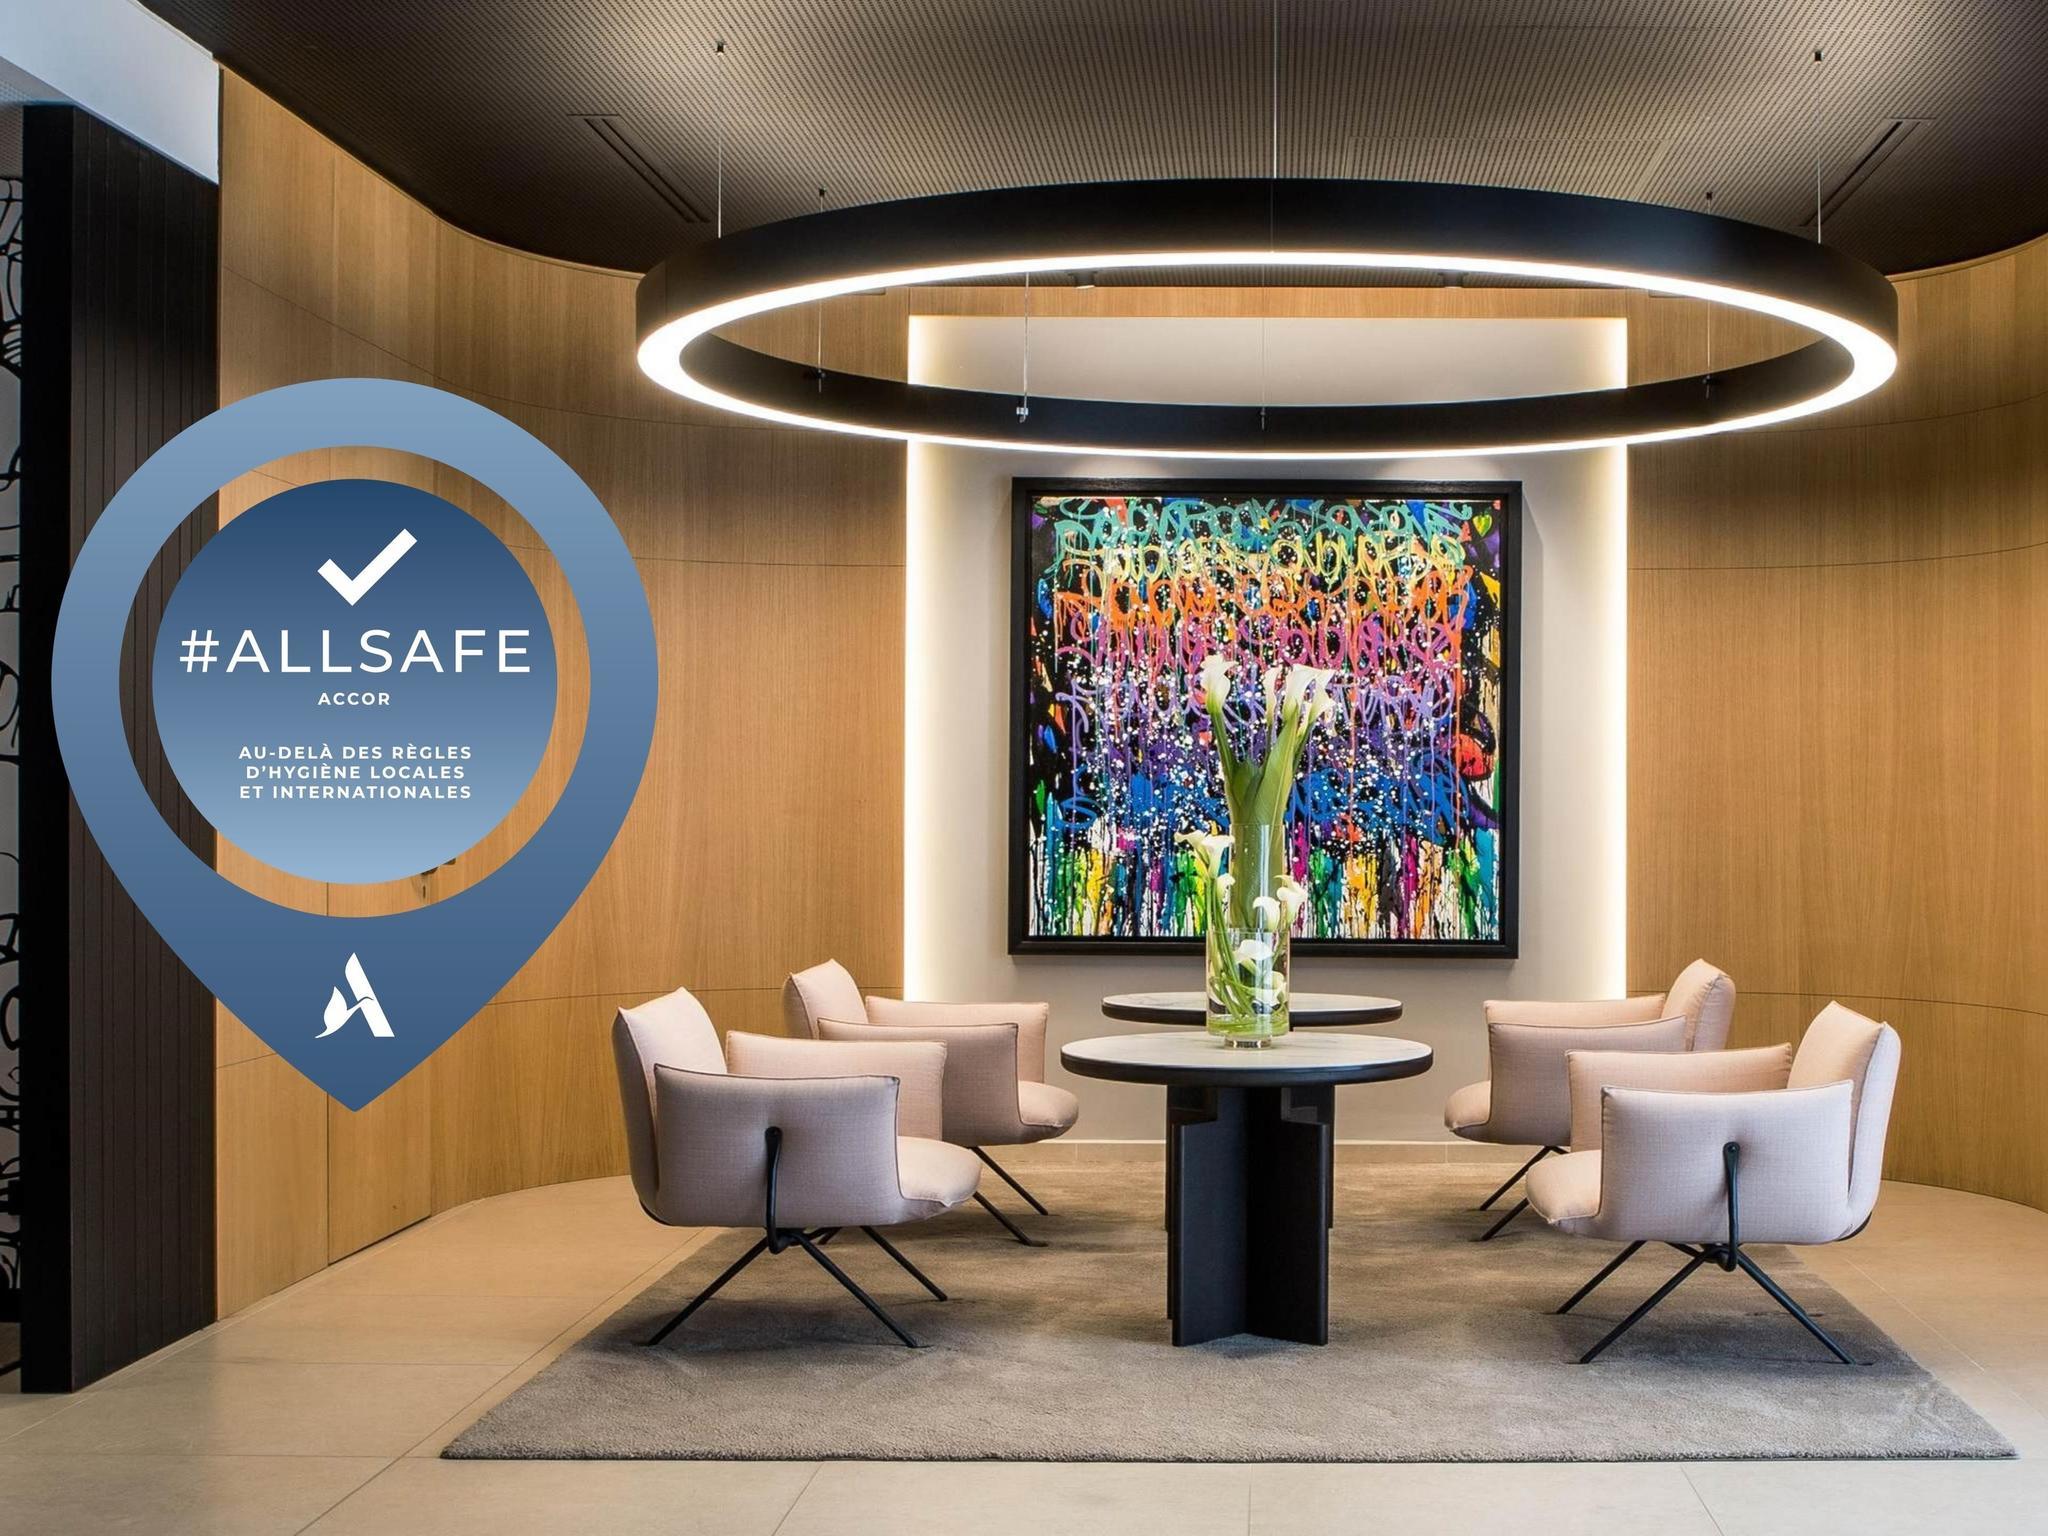 Hotel – Mercure Paris 17 Batignolles (otwarcie w maju 2018 r.)